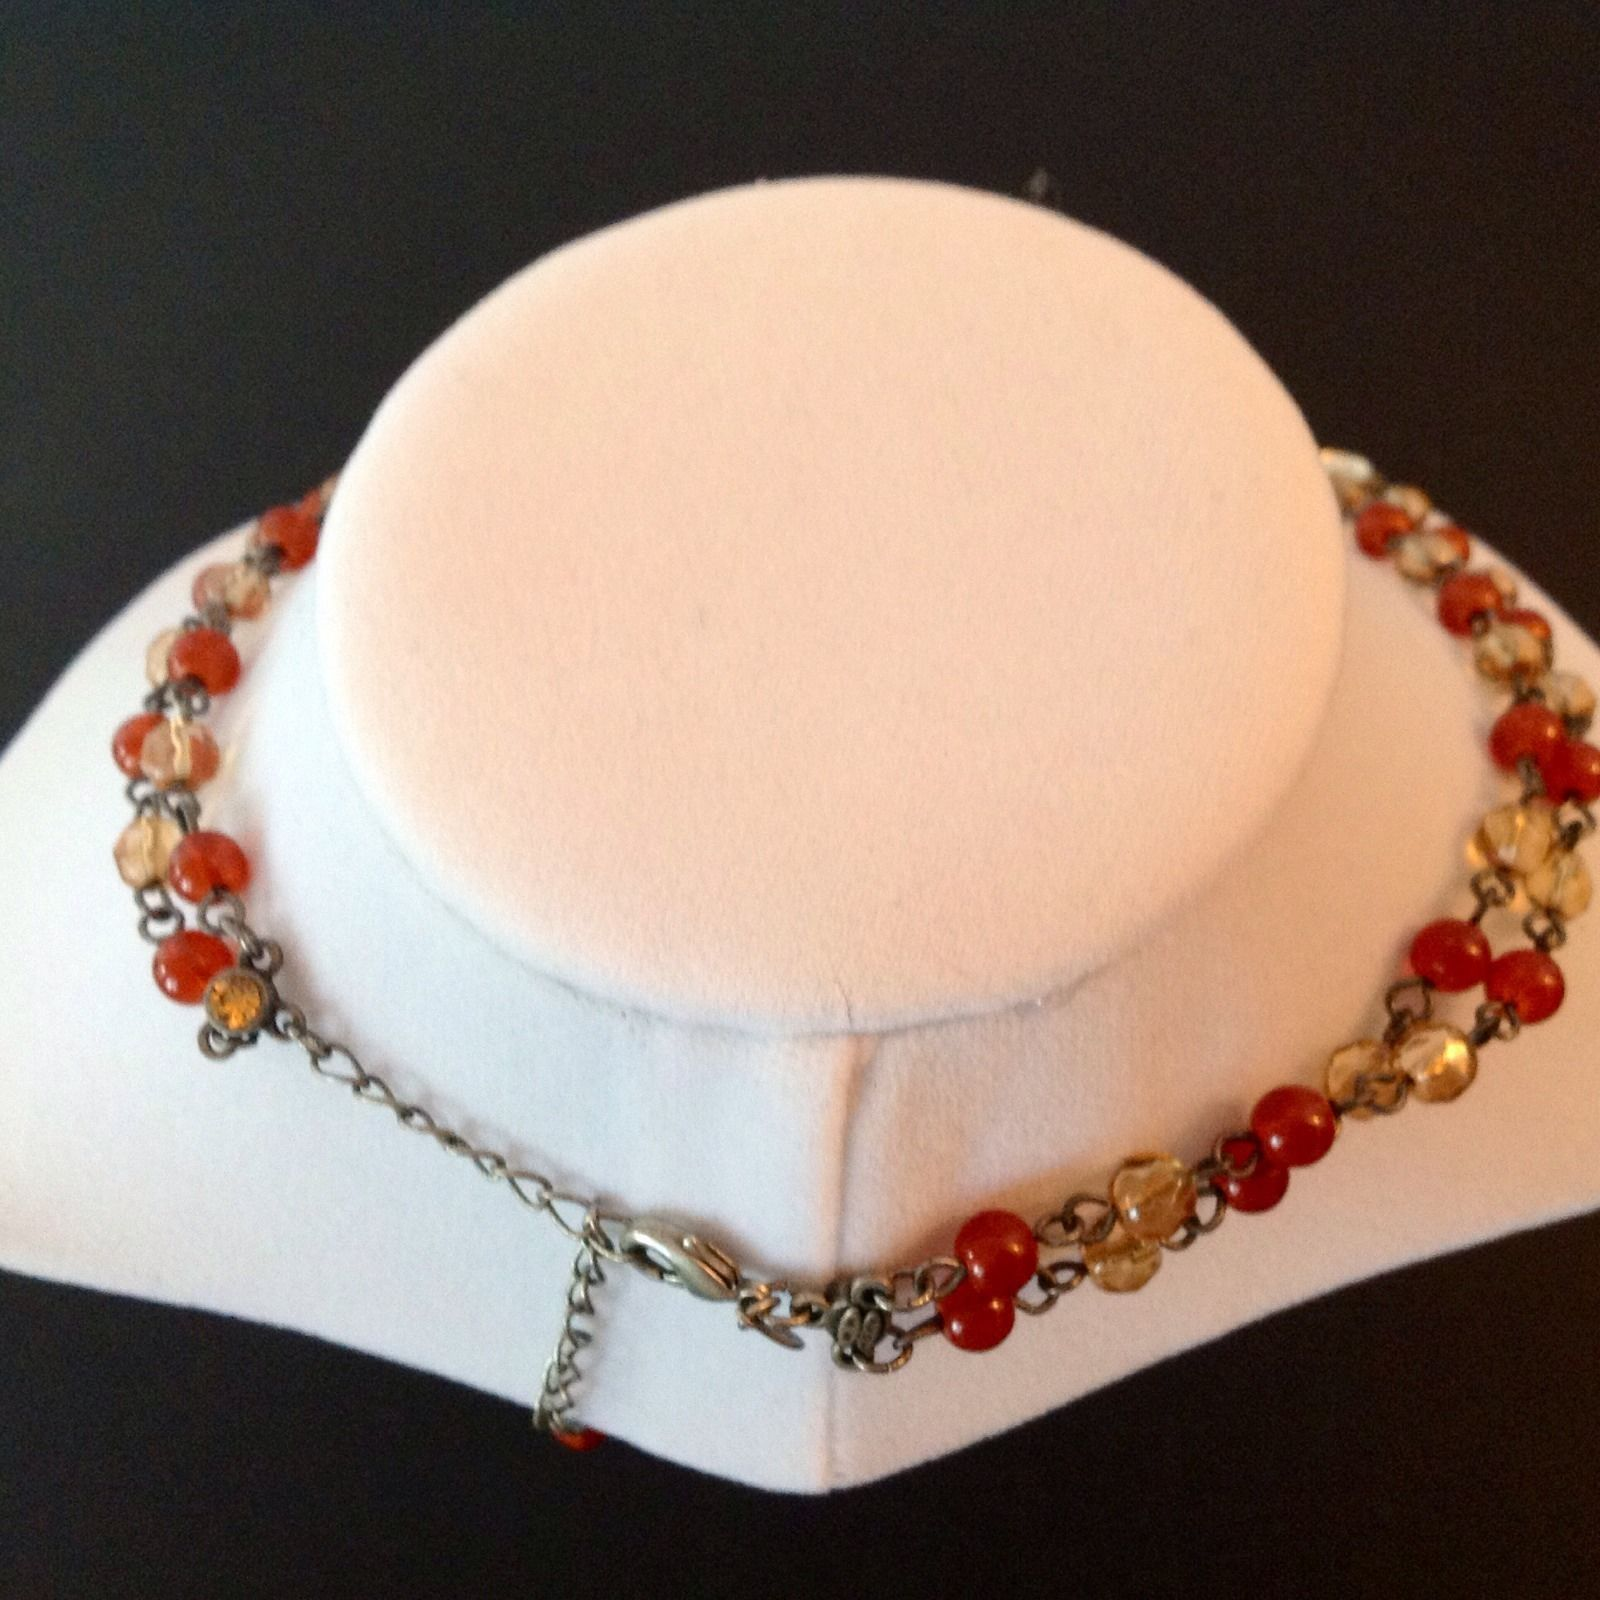 Avon Necklace Bracelet Earrings 3 Piece Set Signed Colored Stones 2002 Vintage image 4